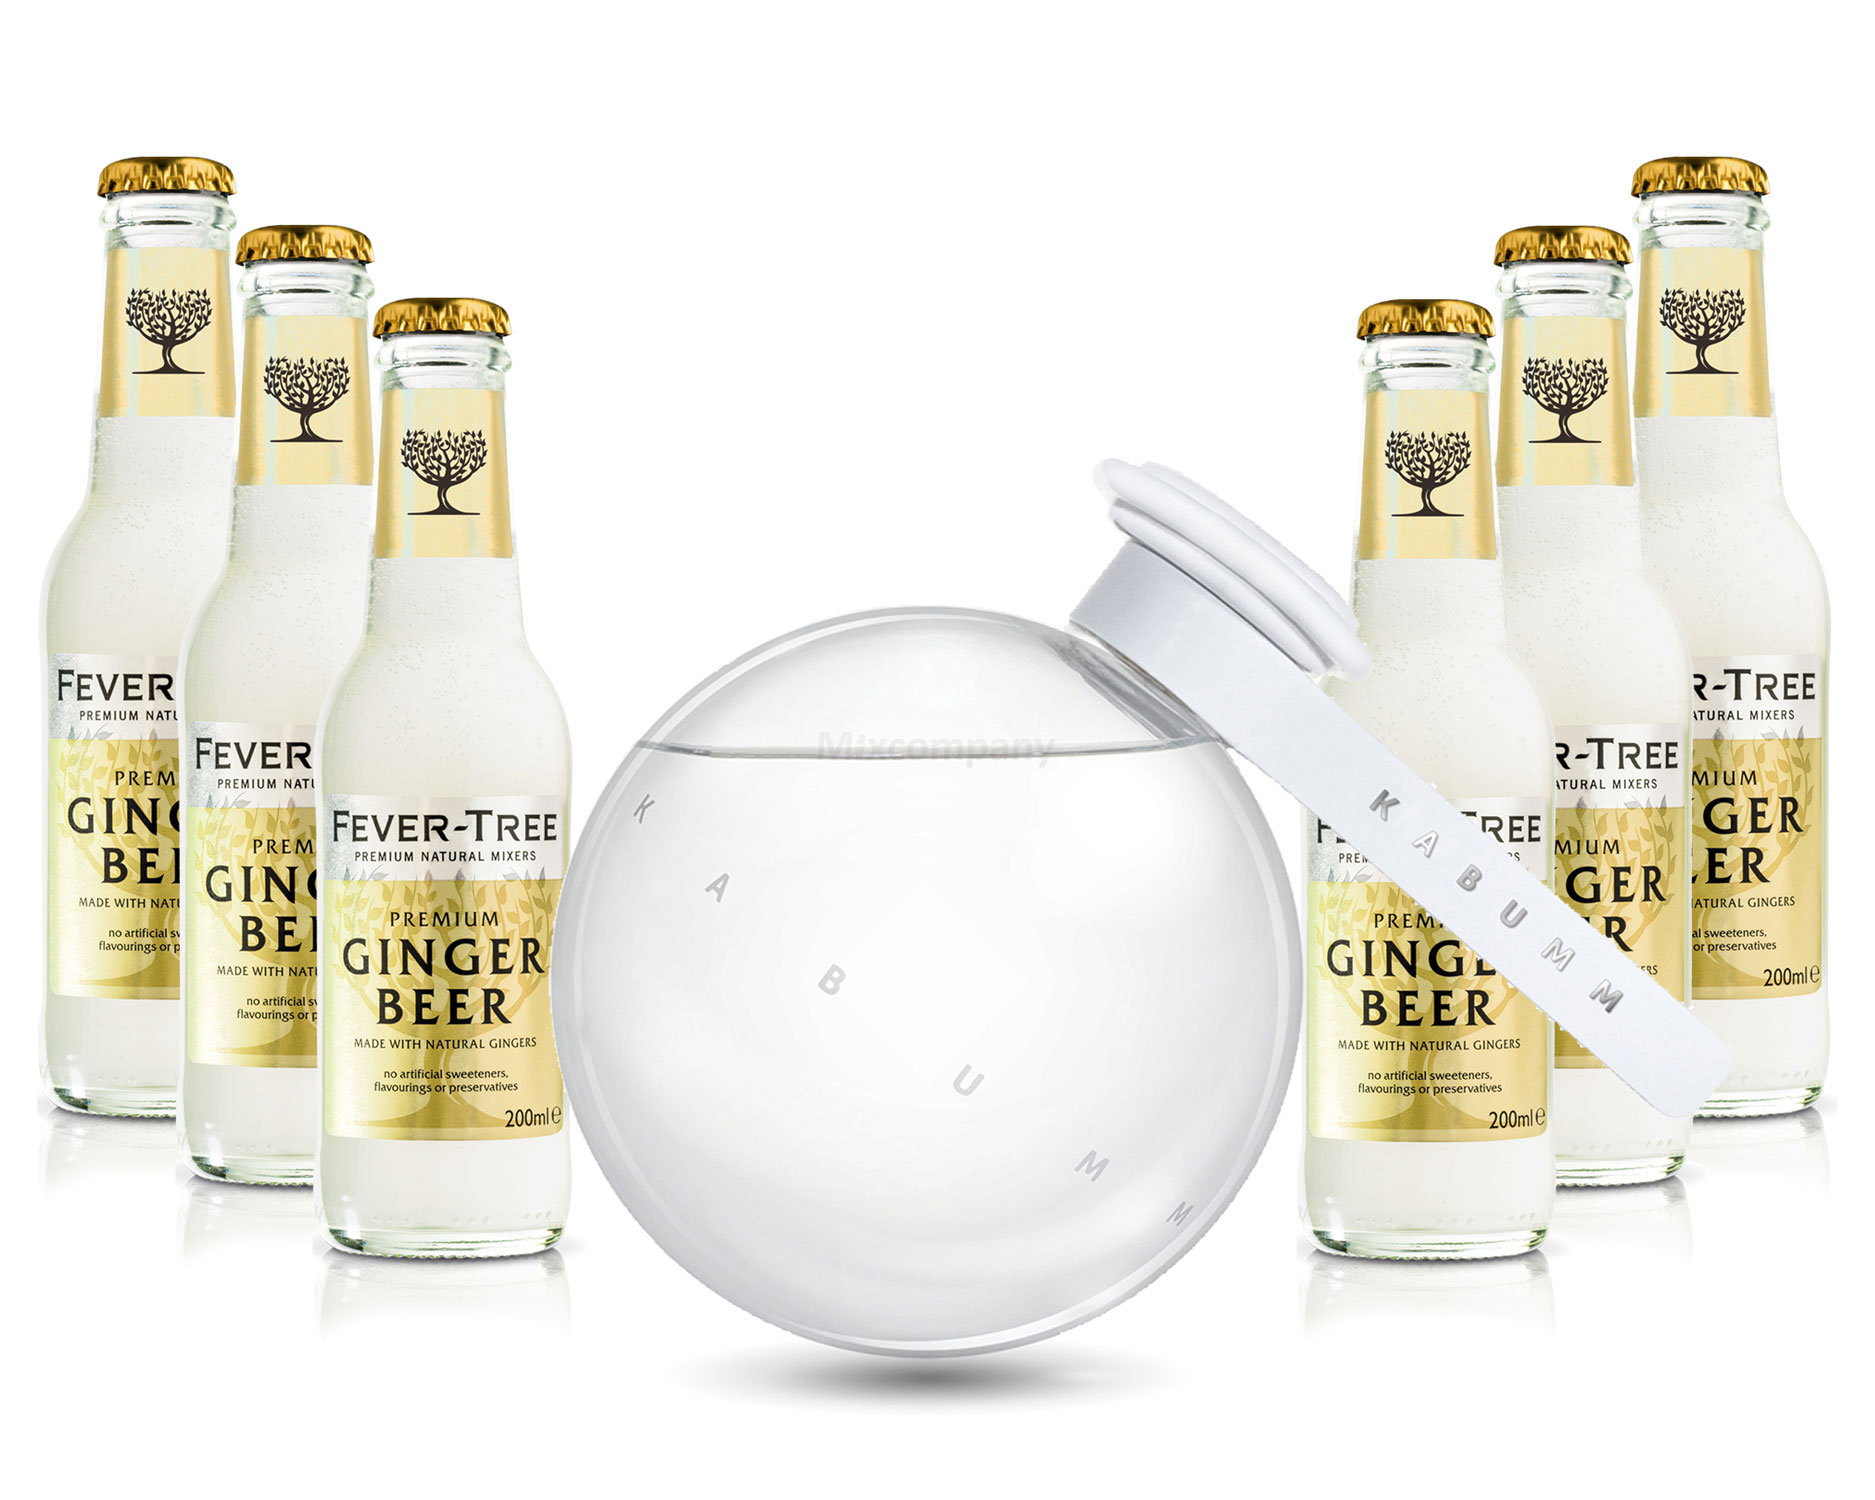 Moscow Mule Set - Kabumm Vodka 0,7l 700ml (40% Vol) + 6x Fever Tree Ginger Beer 200ml - Inkl. Pfand MEHRWEG